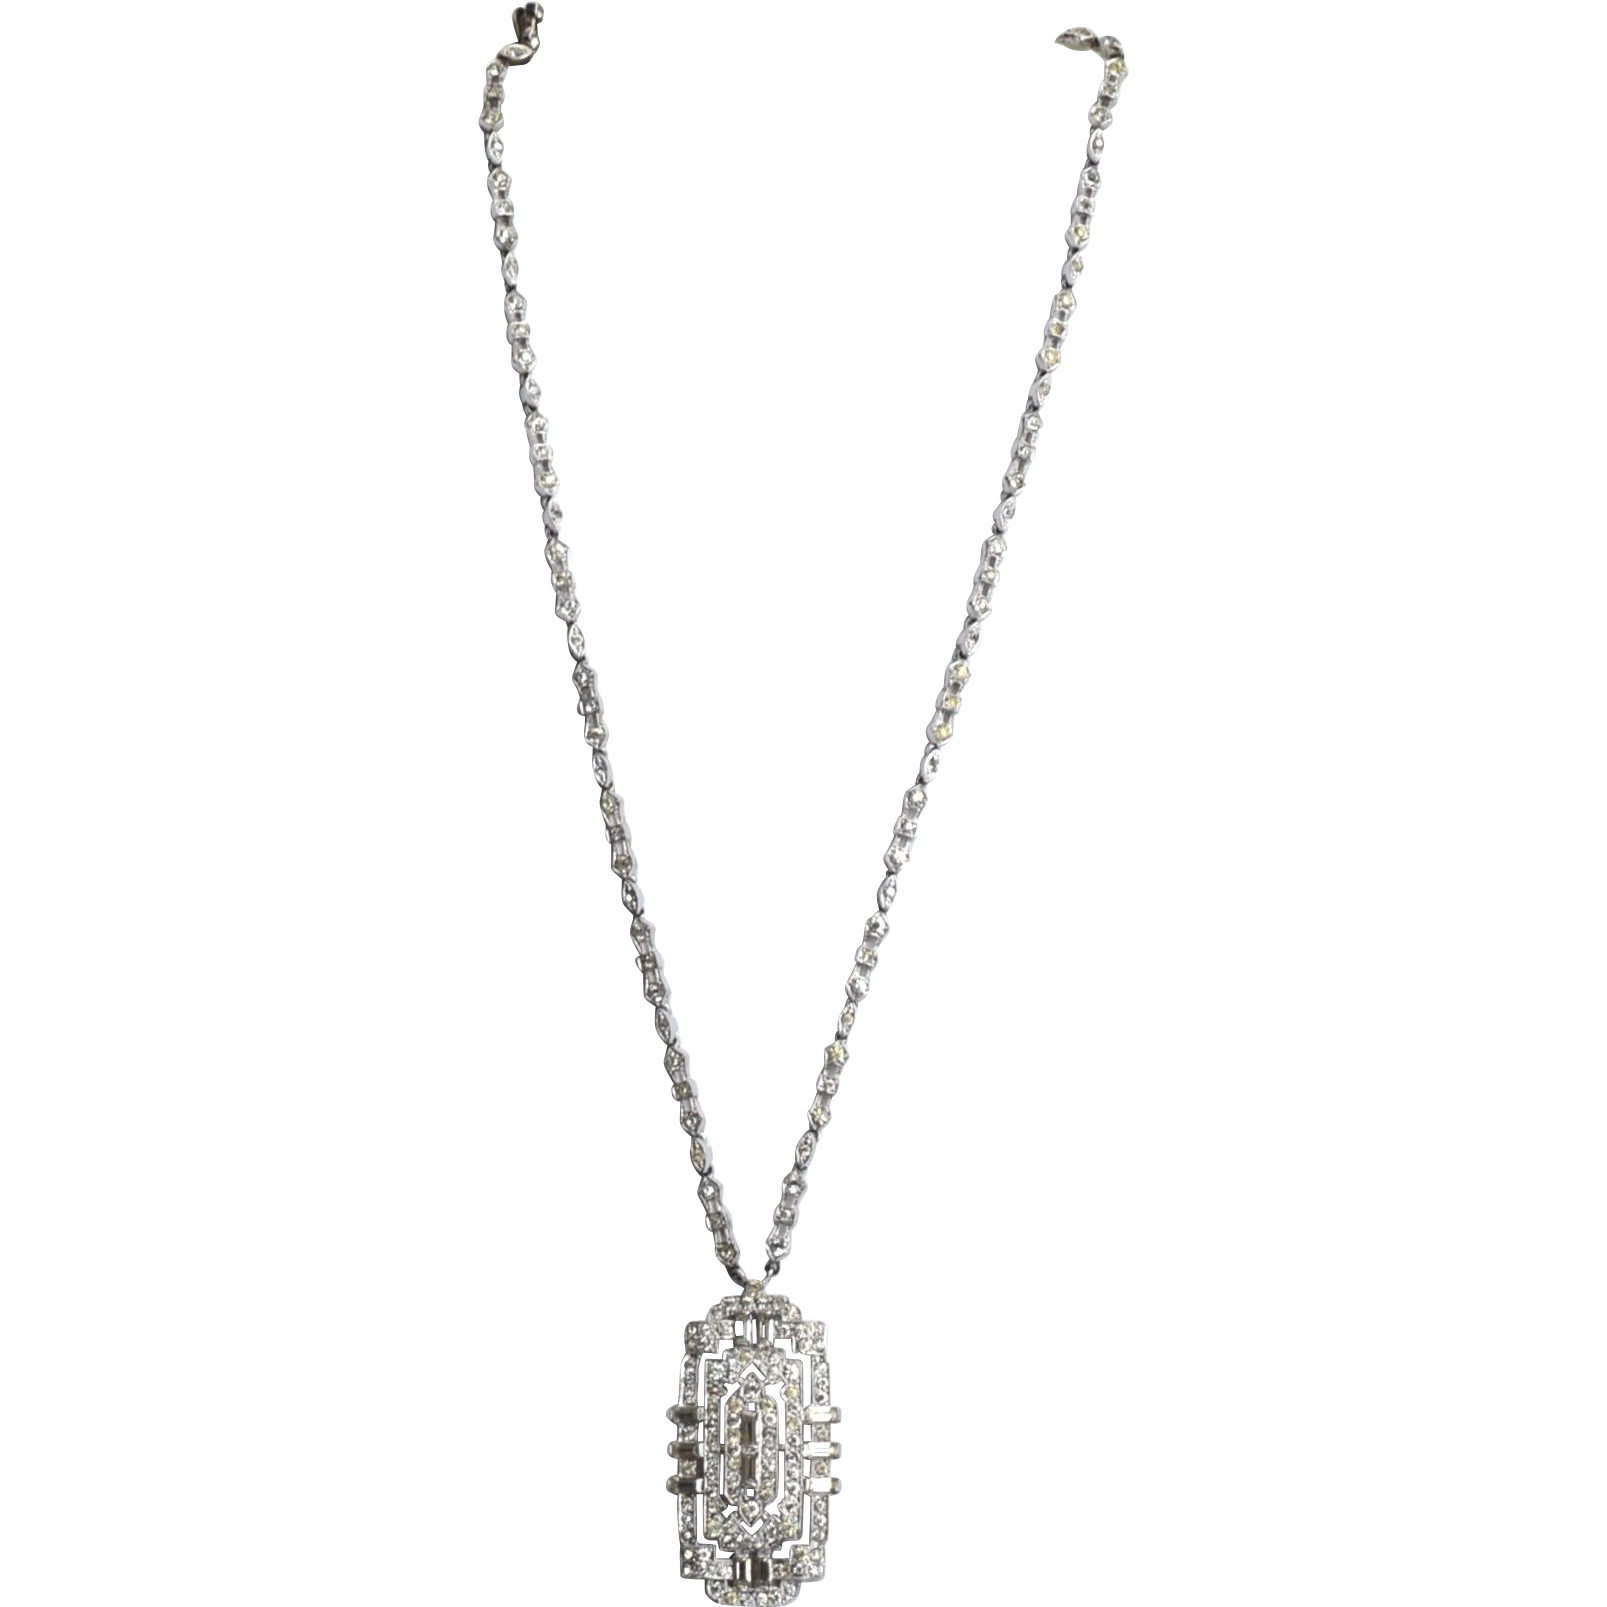 1930's KTF Trifari Krussman Fishel Art Deco Style Rhinestone Necklace, Very Rare Piece!